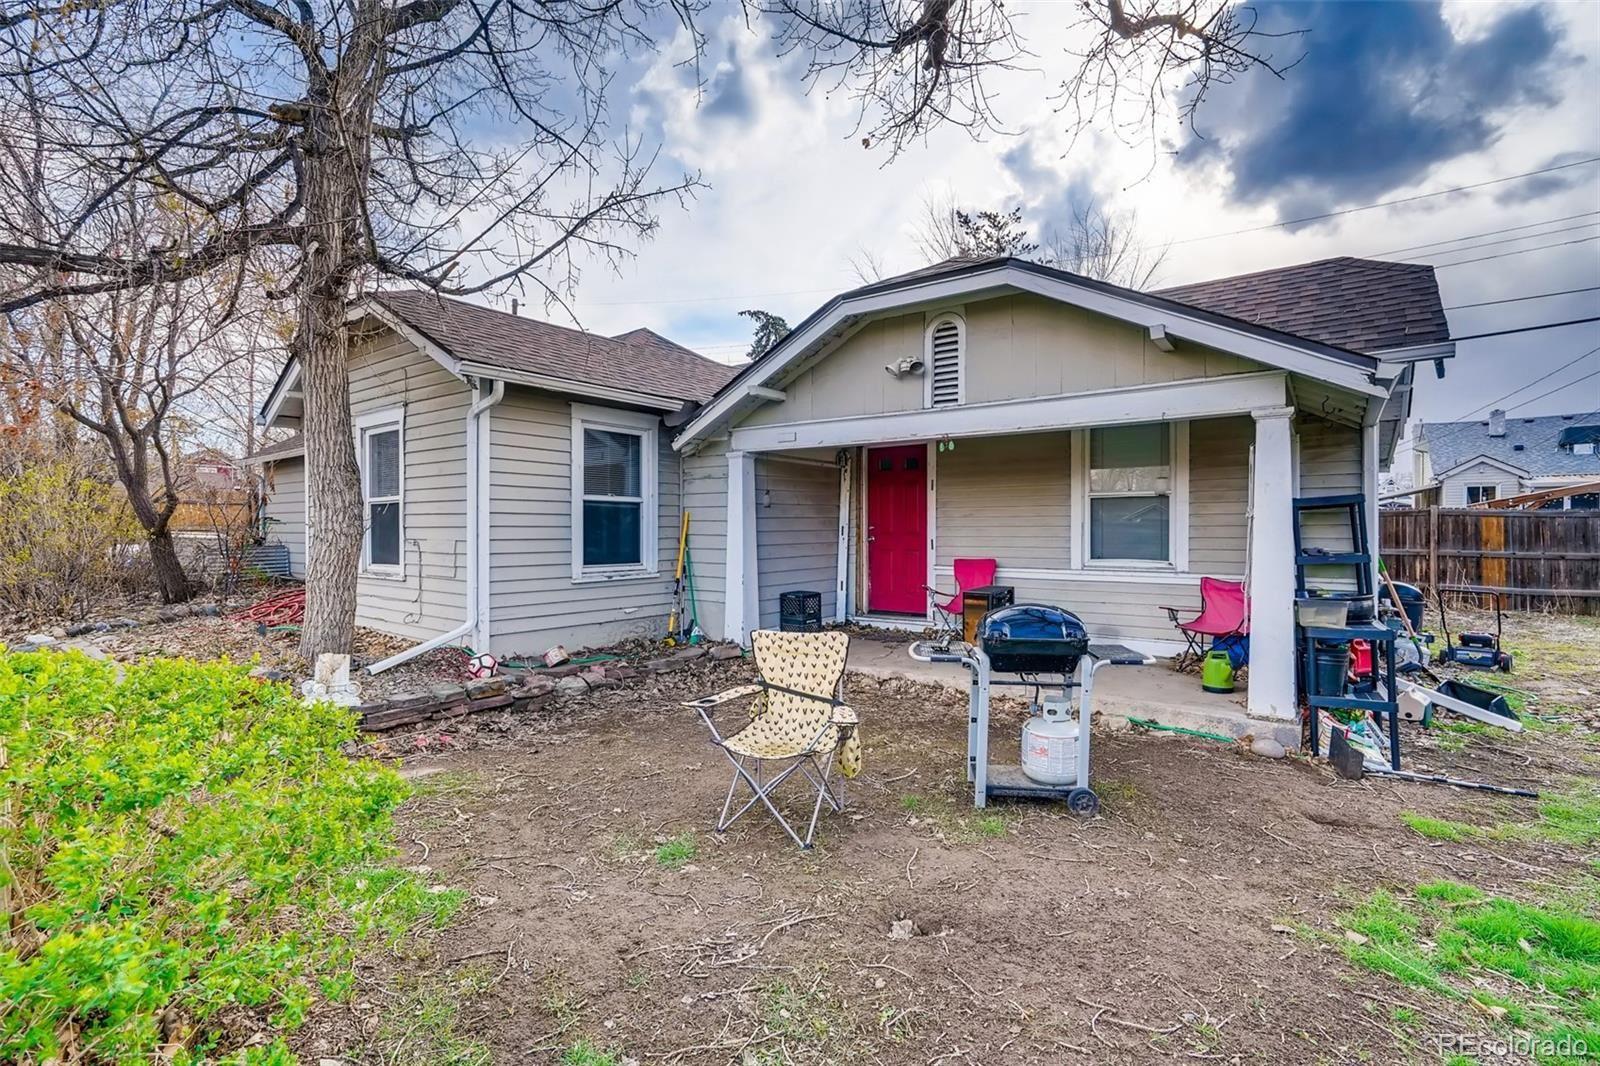 Photo of 4145 Sheridan Boulevard, Denver, CO 80212 (MLS # 4477403)